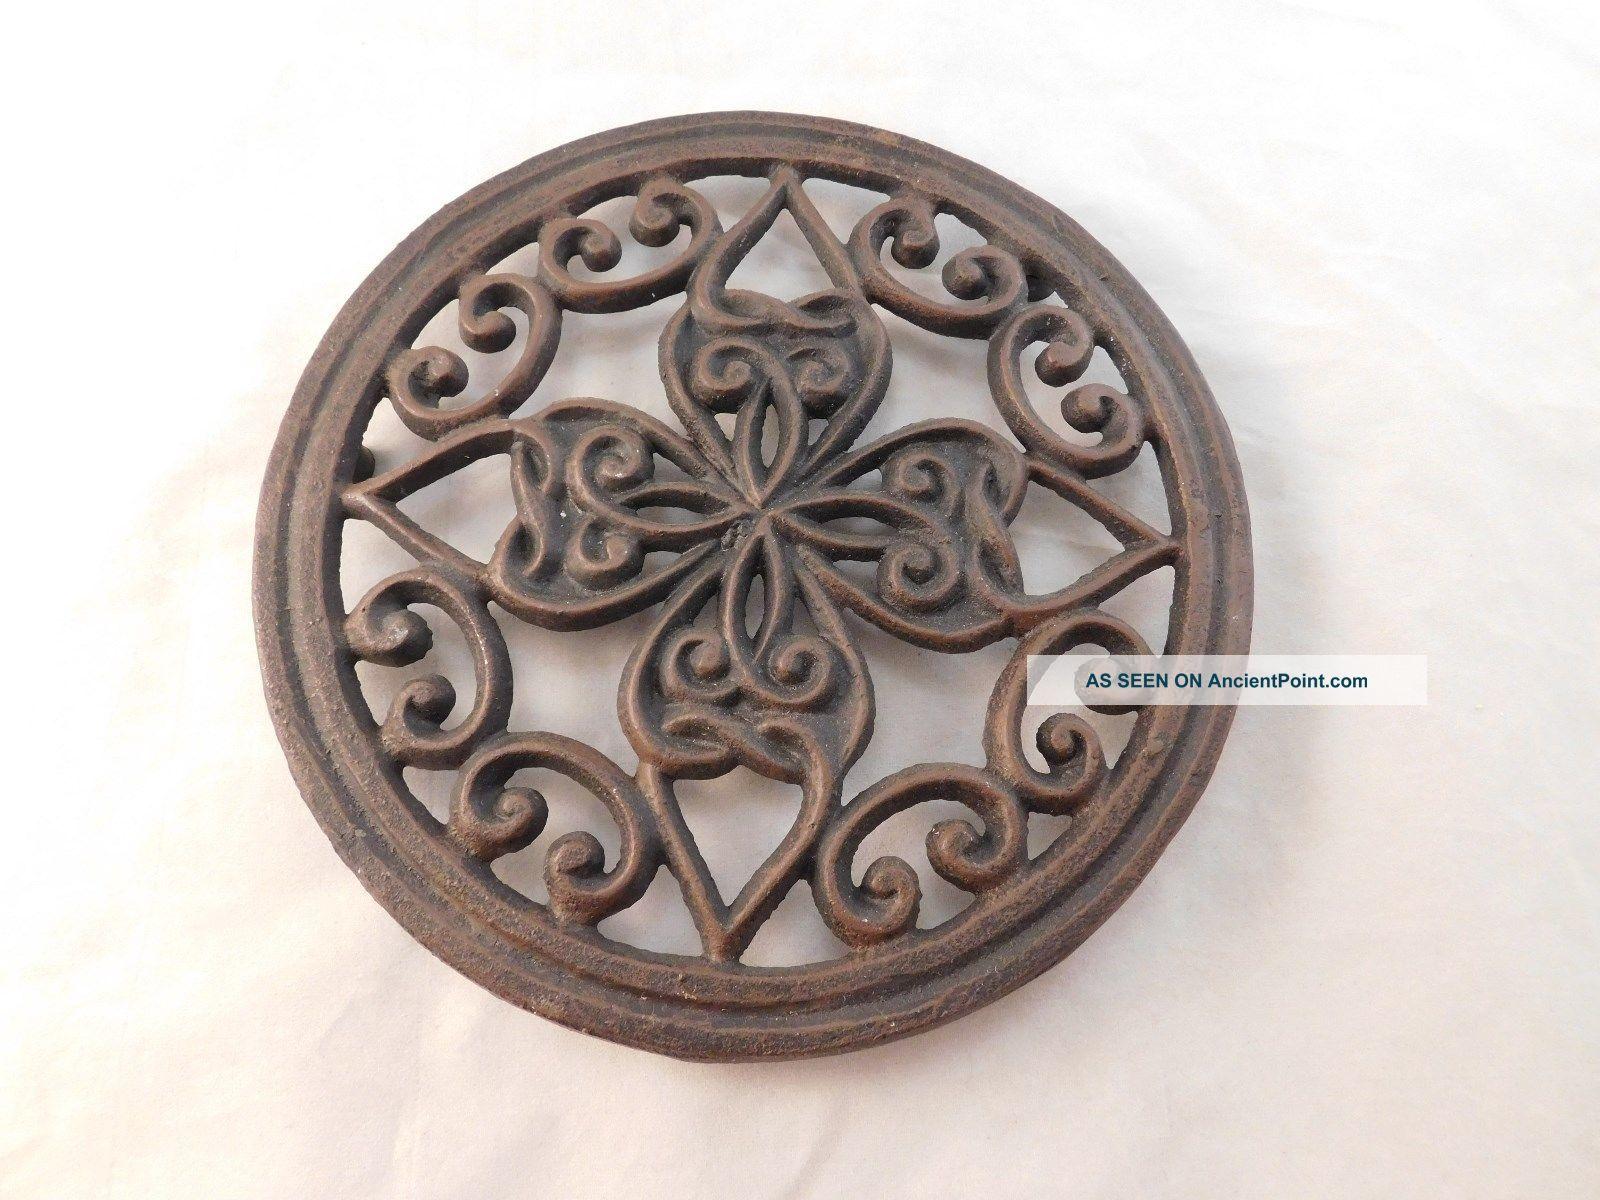 Antique Cast Iron Heart And Scroll Triveit - Circa 1900 Trivets photo